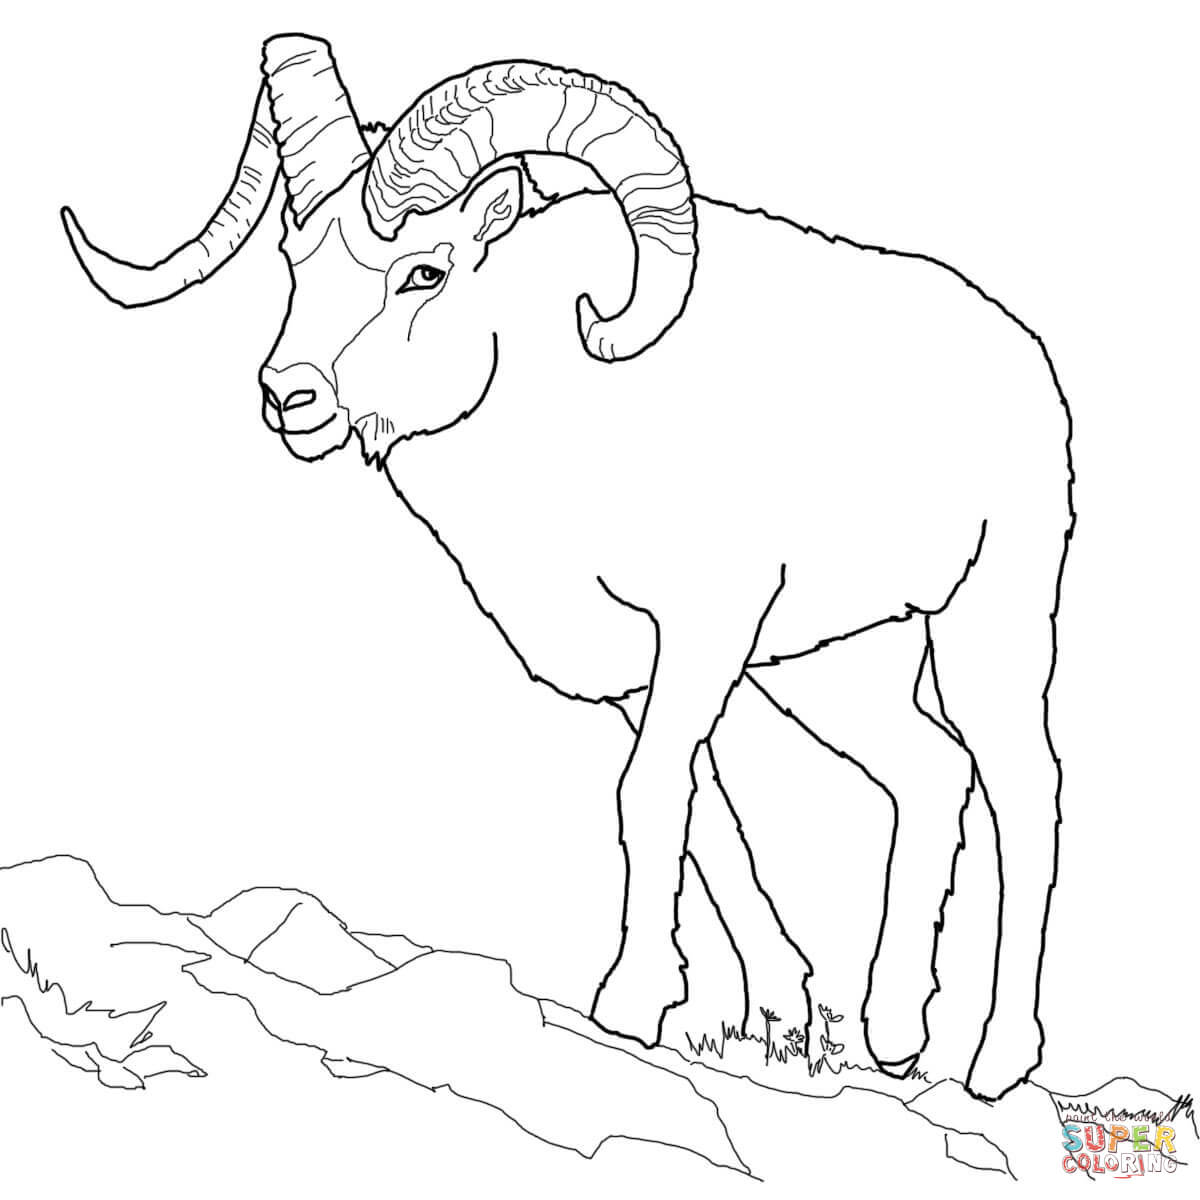 Dall Sheep coloring #10, Download drawings